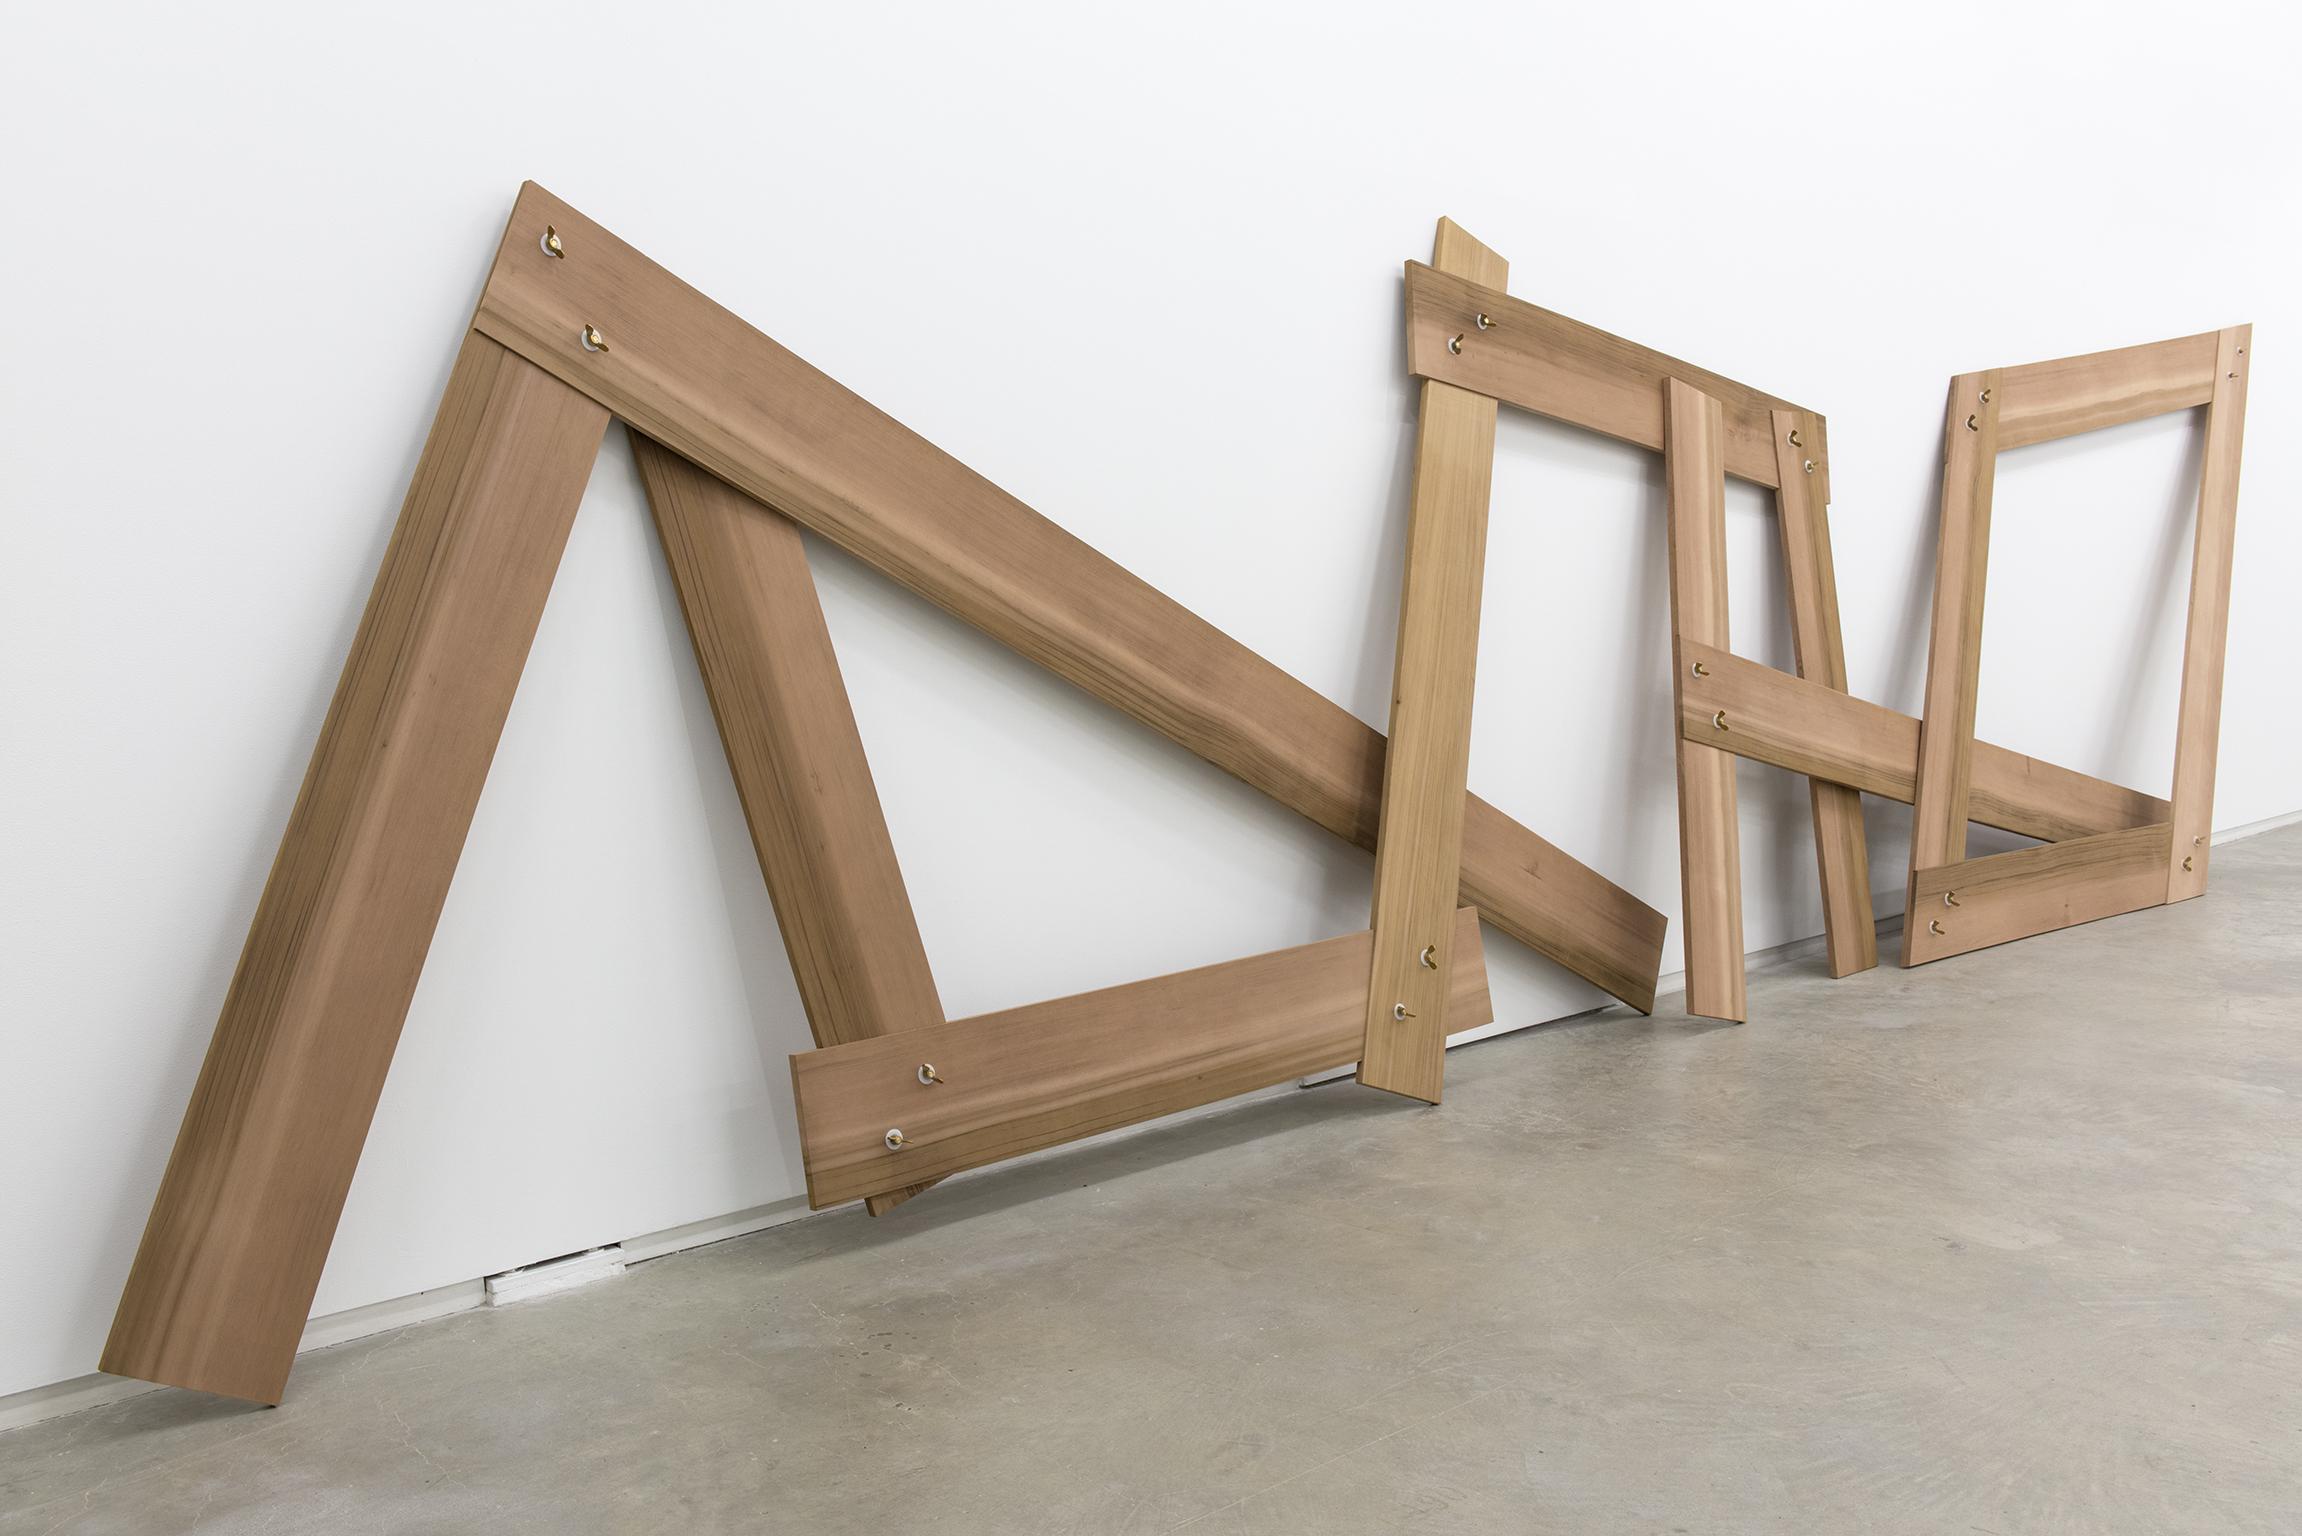 Christina Mackie, Lots/lost, 2012, cedar, brass, nylon, 94 x 388 x 19 in. (238 x 986 x 48 cm) by